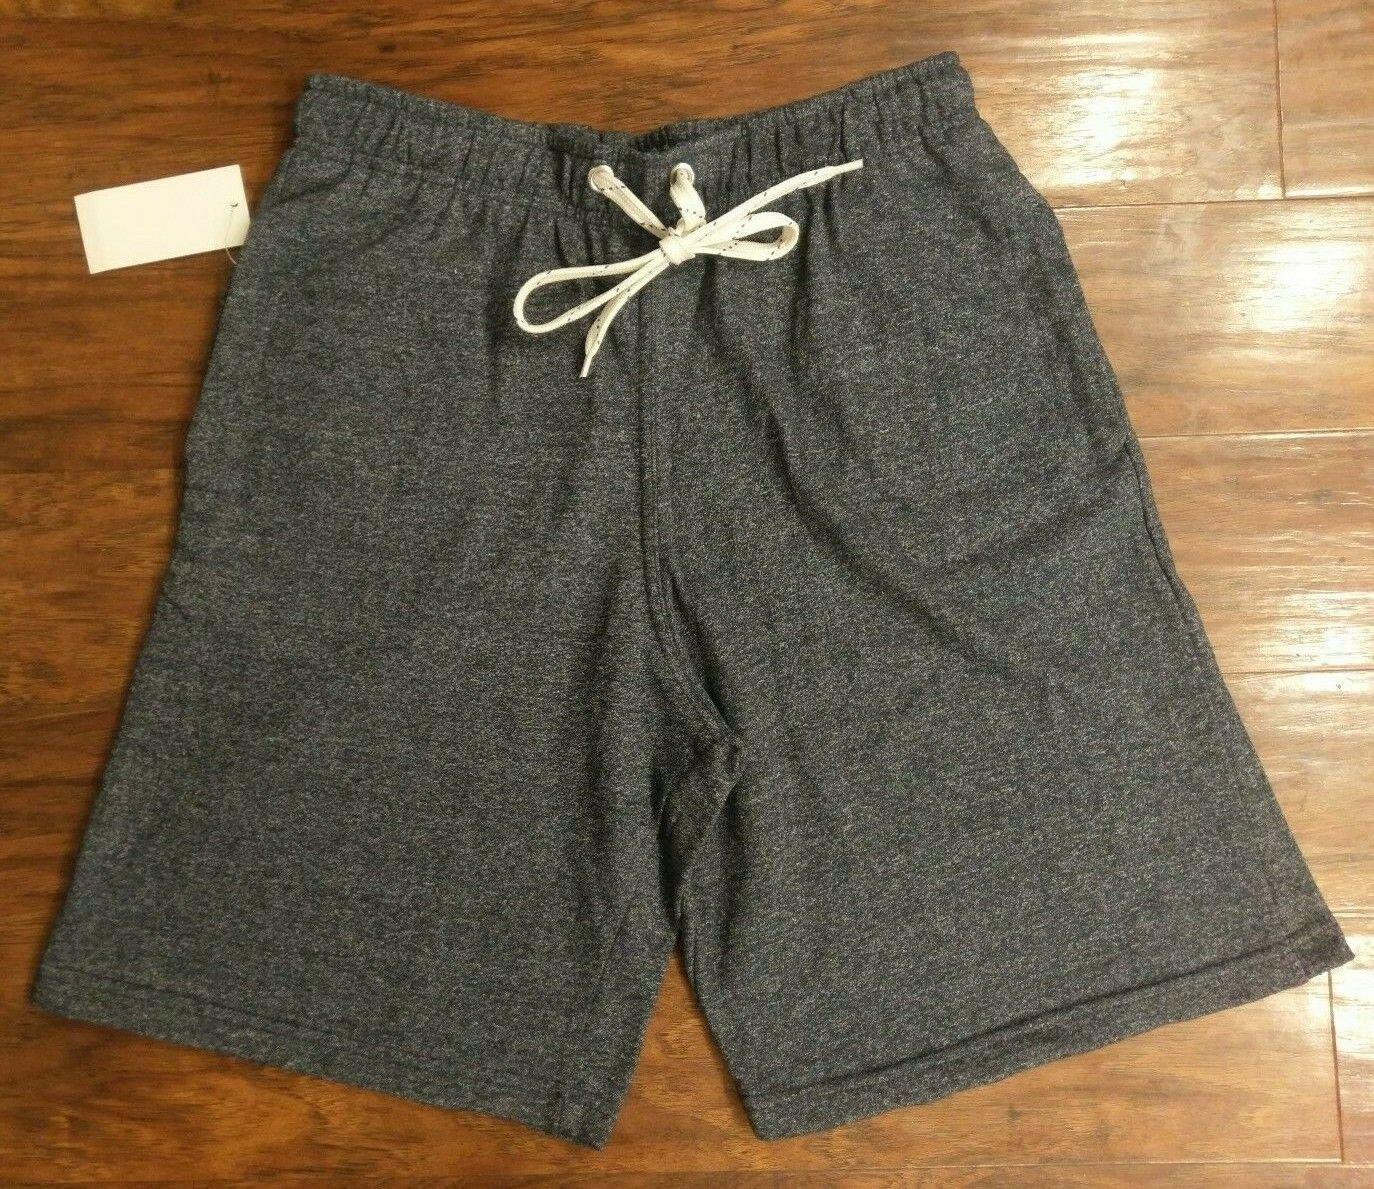 Men's NAVY BLUE Knit Athletic Shorts With Pockets, sz MEDIUM new nwt